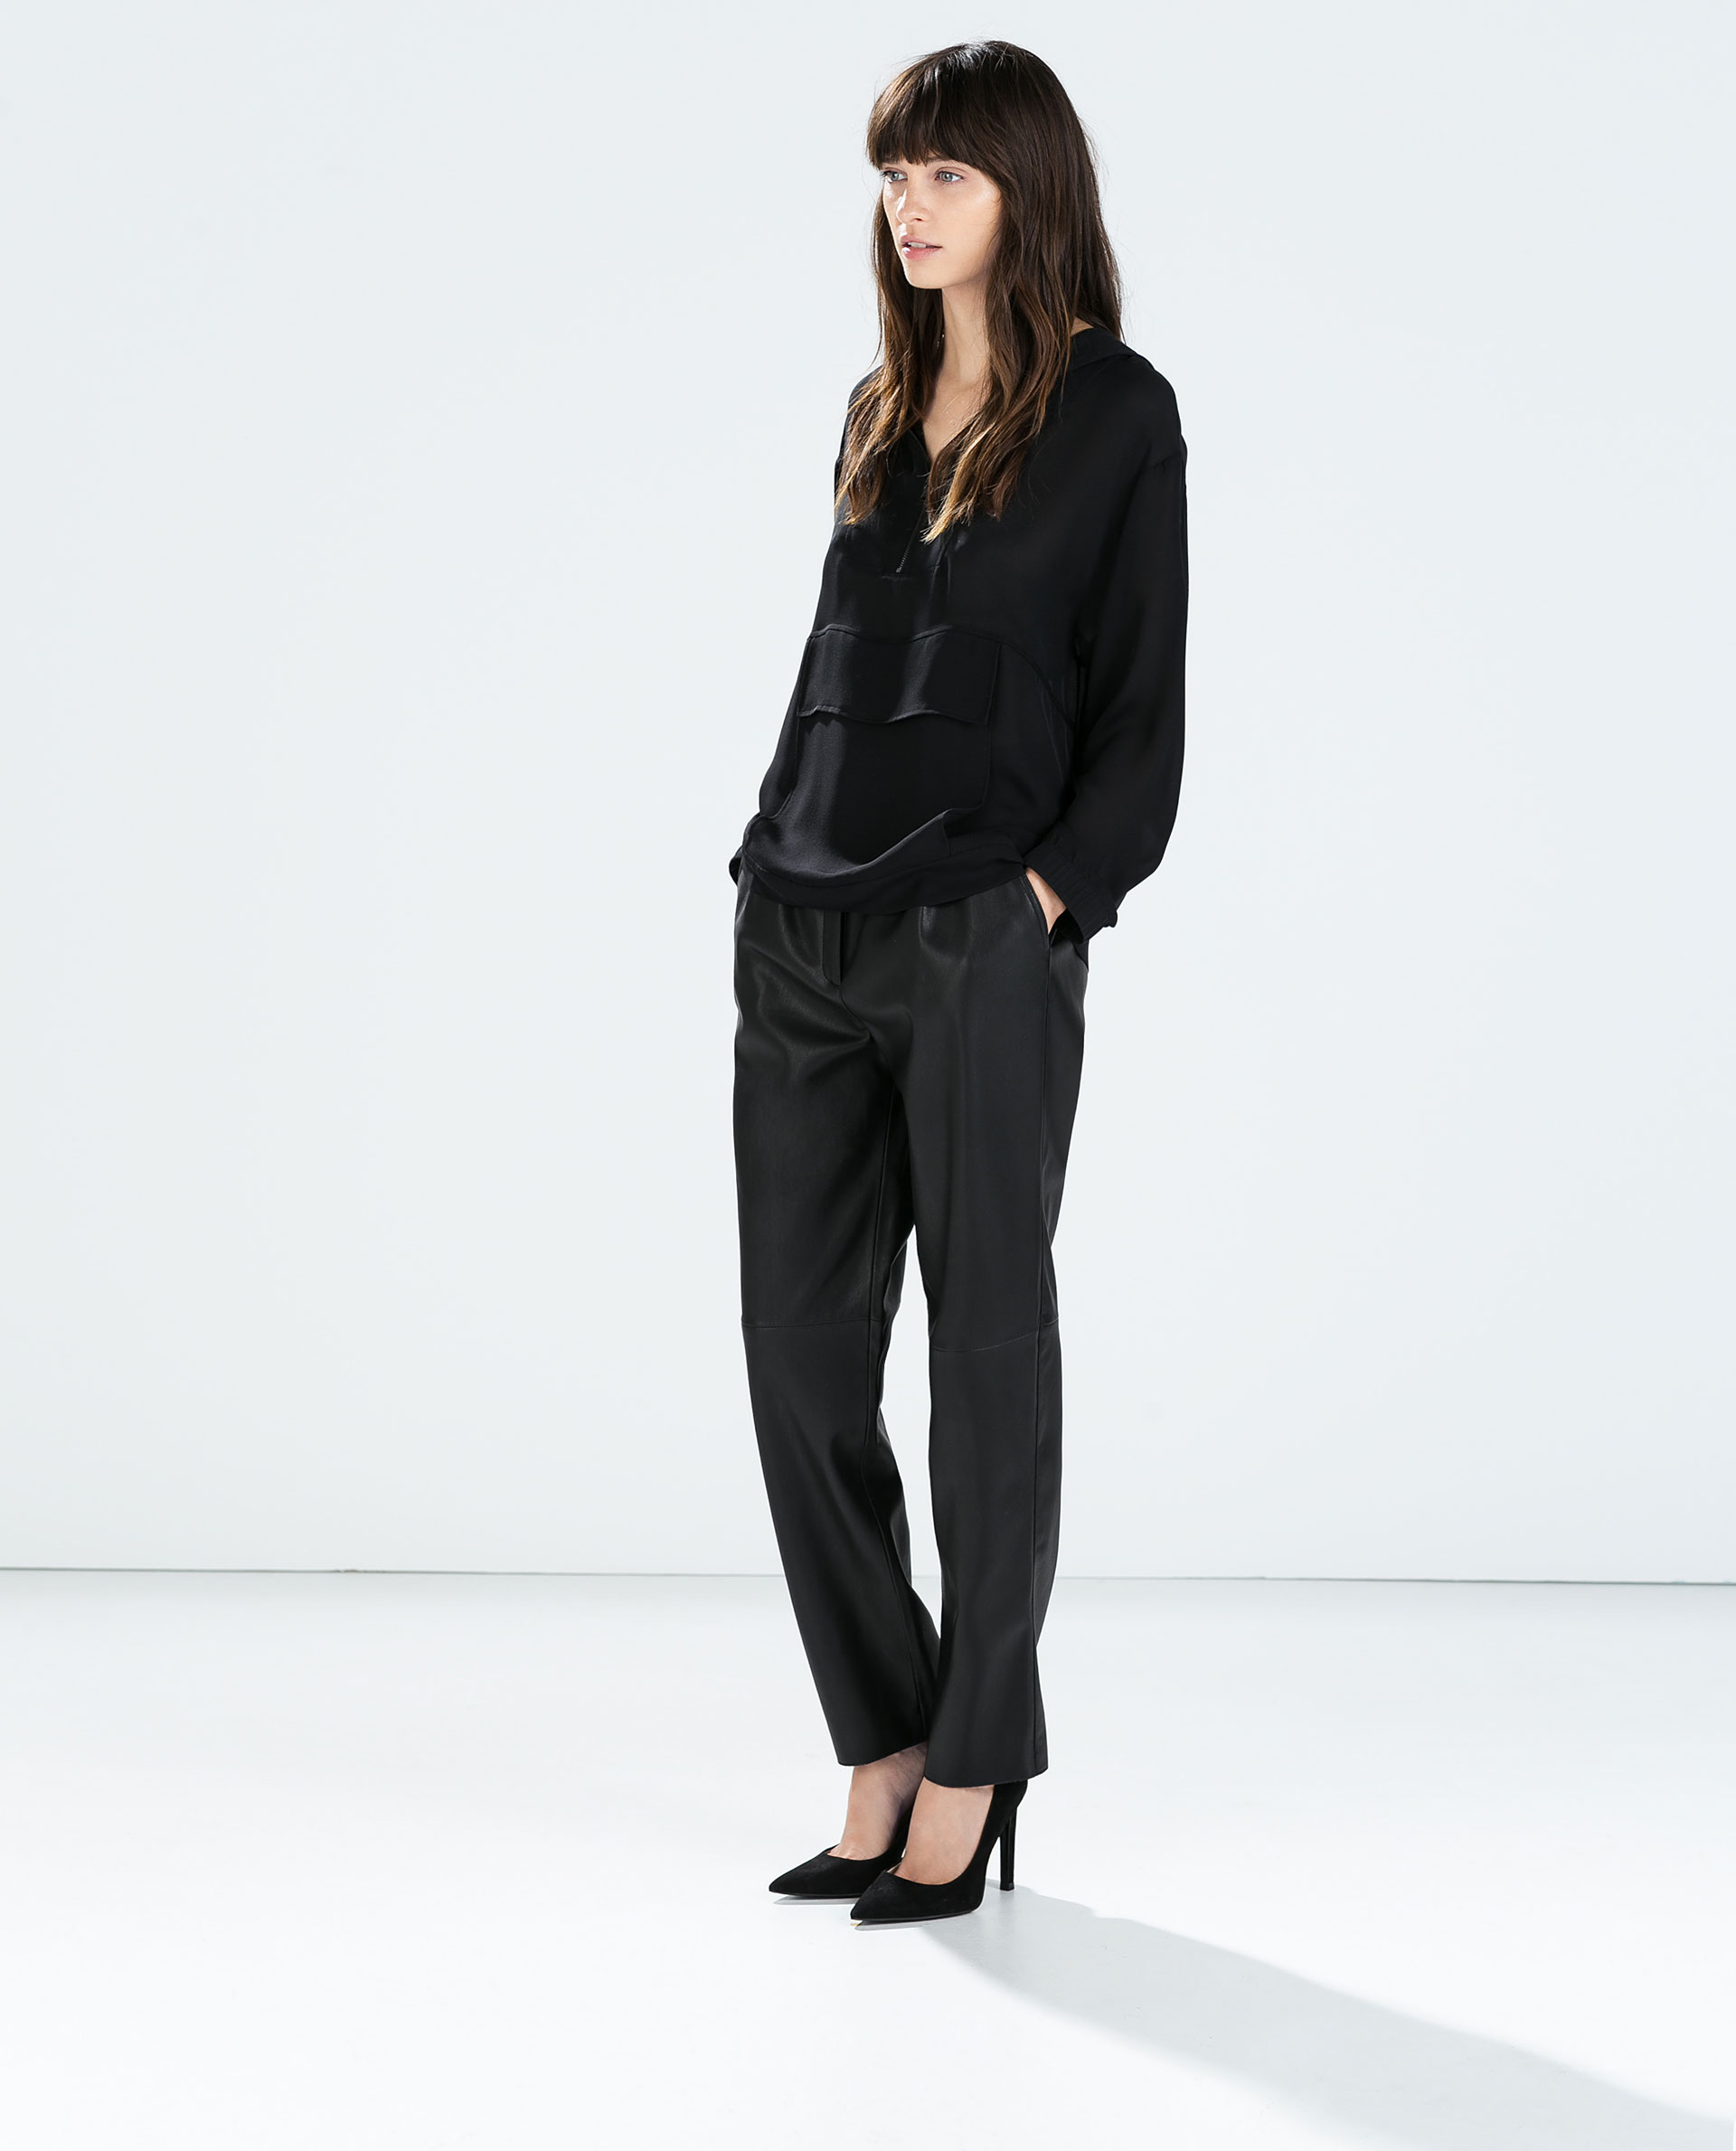 New ZARA Woman BNWT Authentic Faux Leather Biker Trousers Pants Zips M L